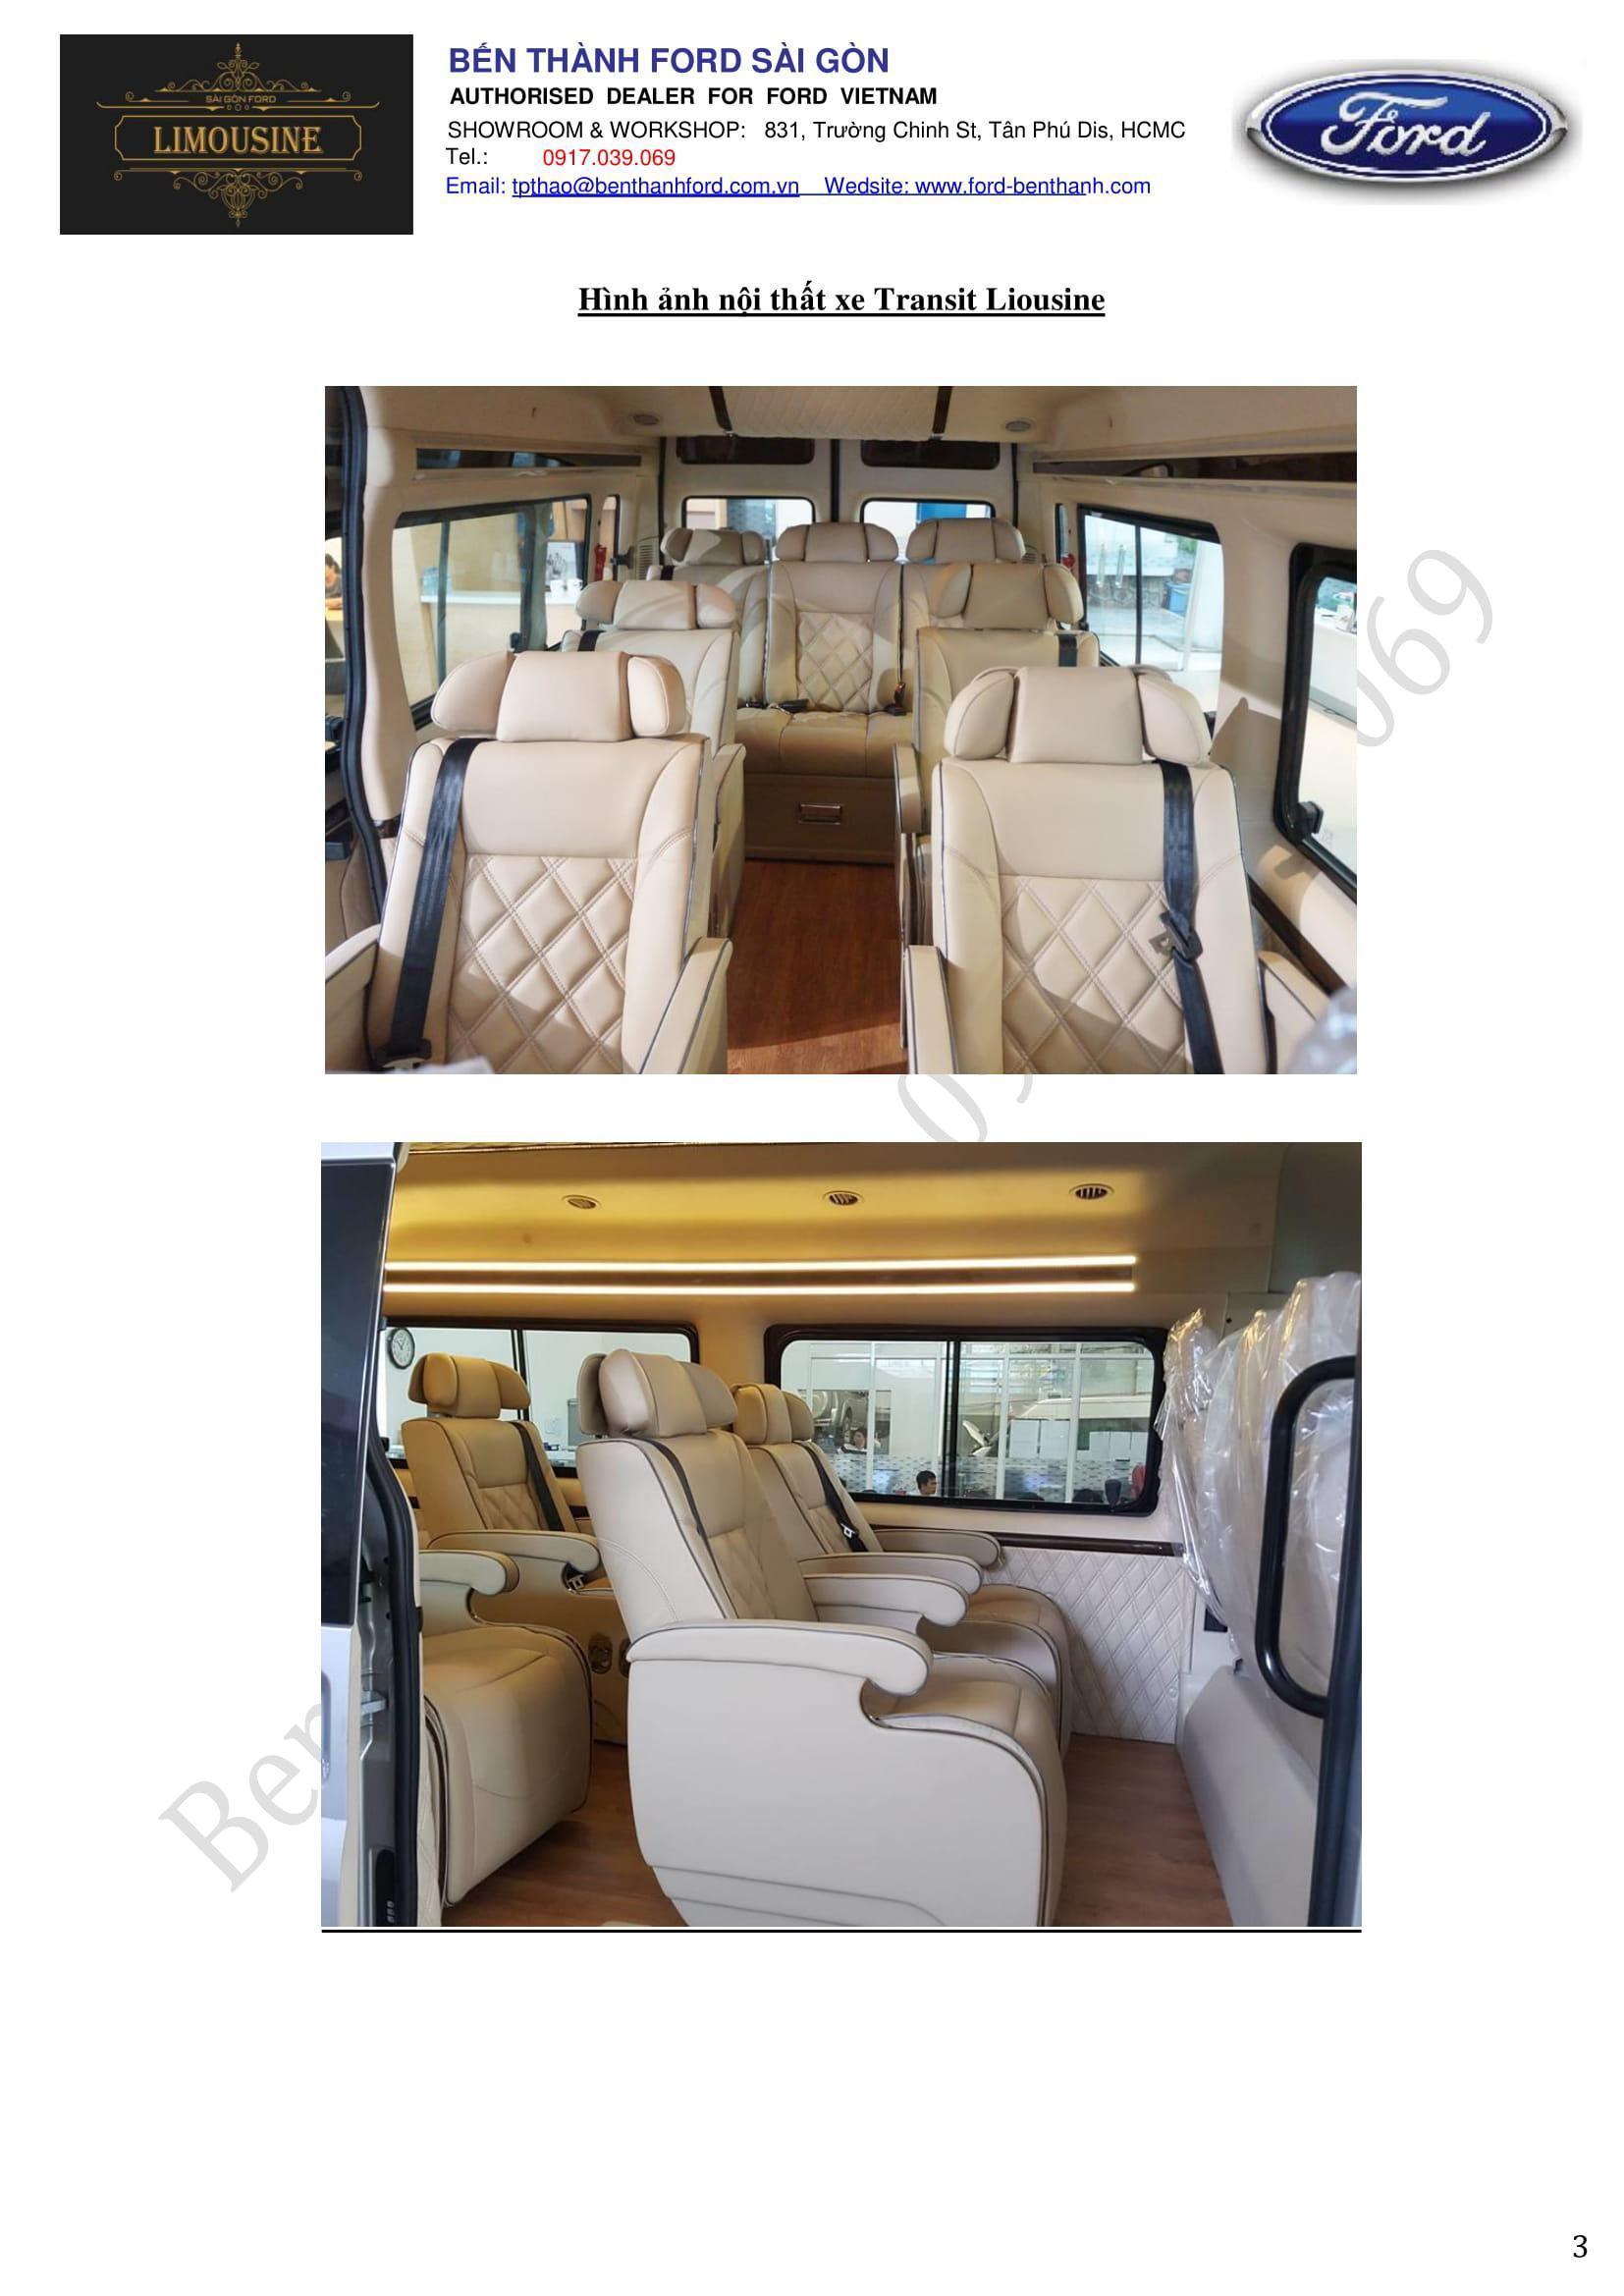 Limousine 1,195 BenThanhFord 0917039069-3